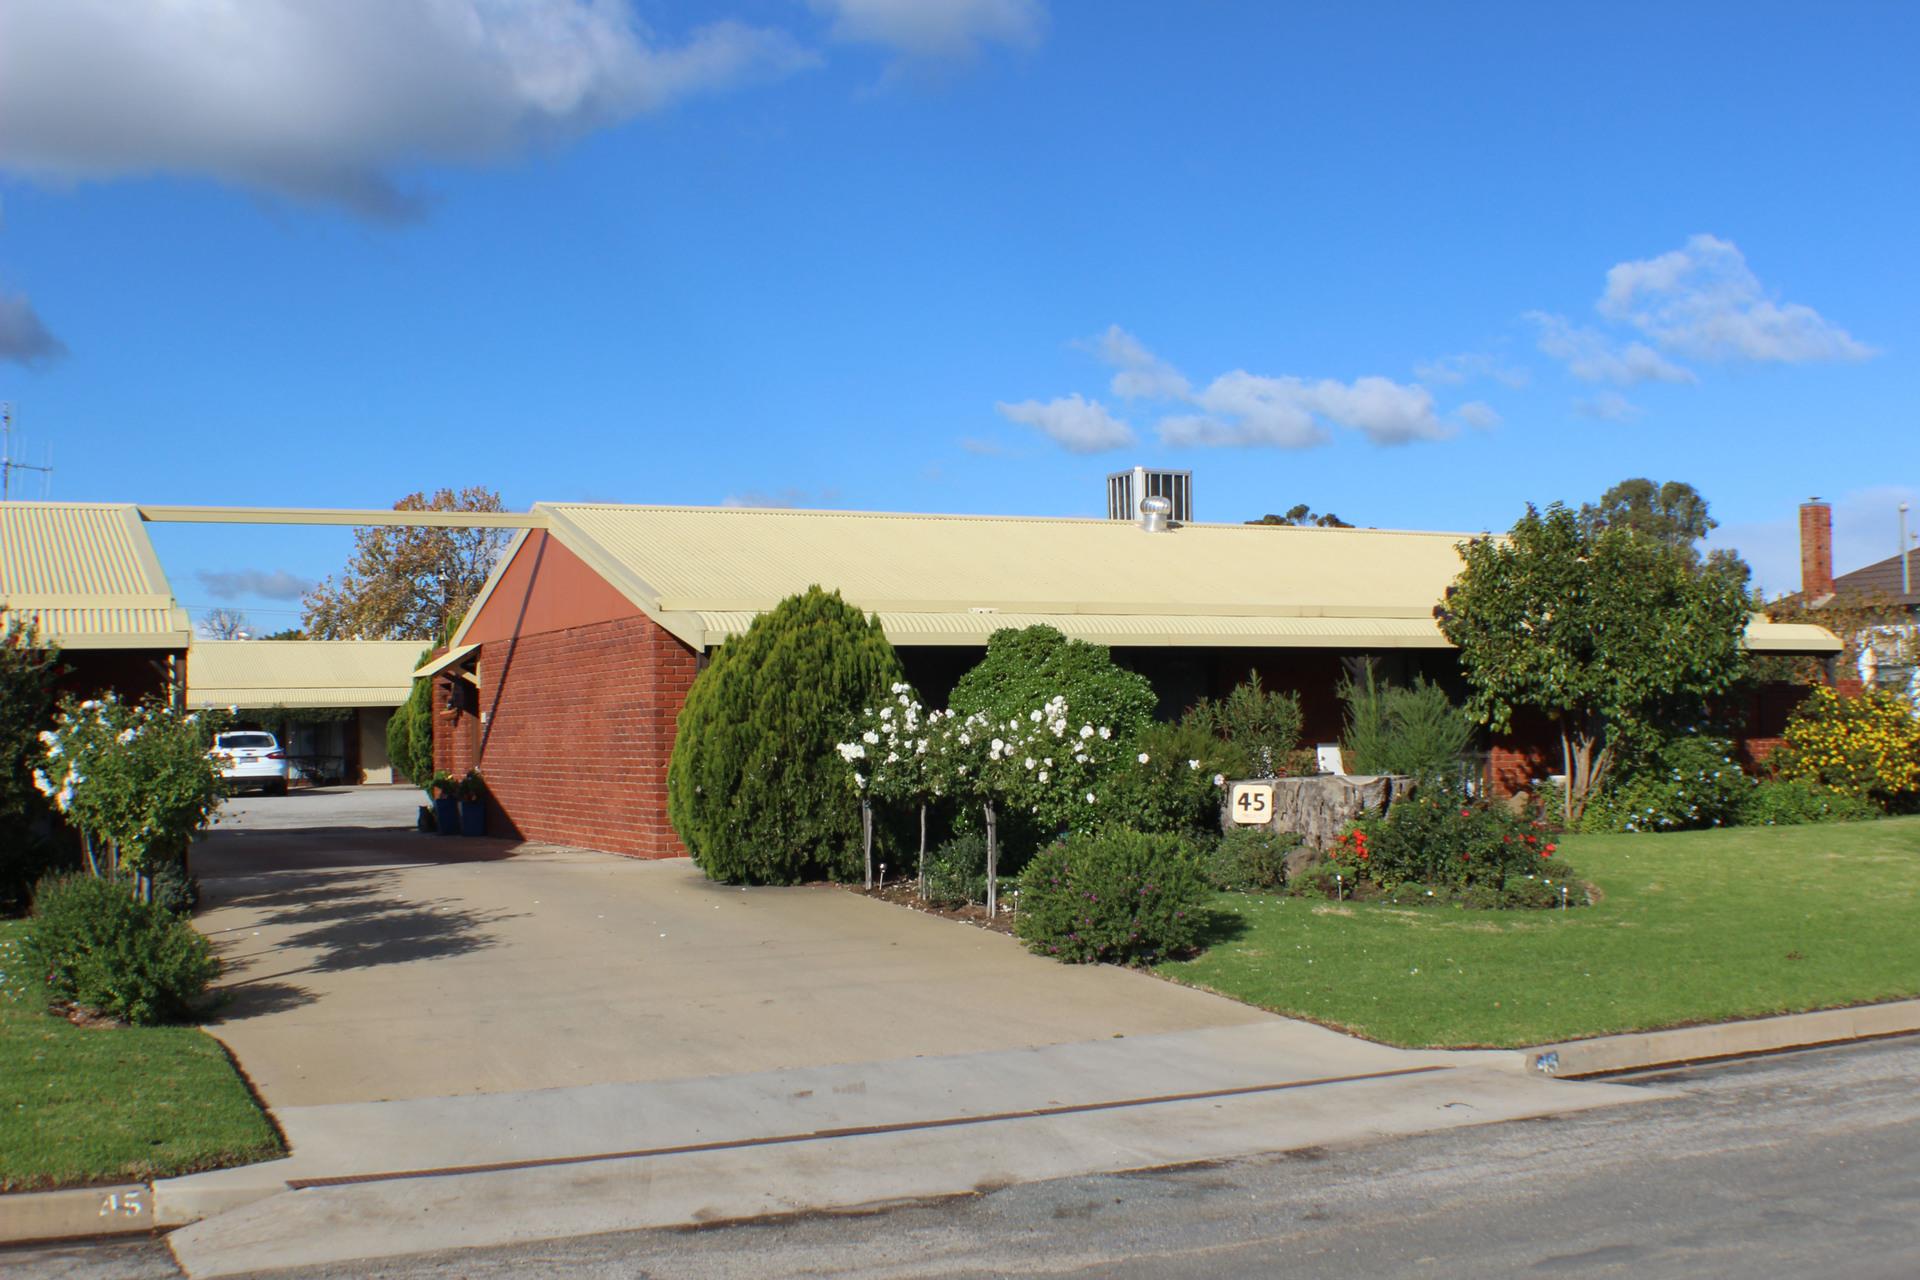 h - Riverland Motel